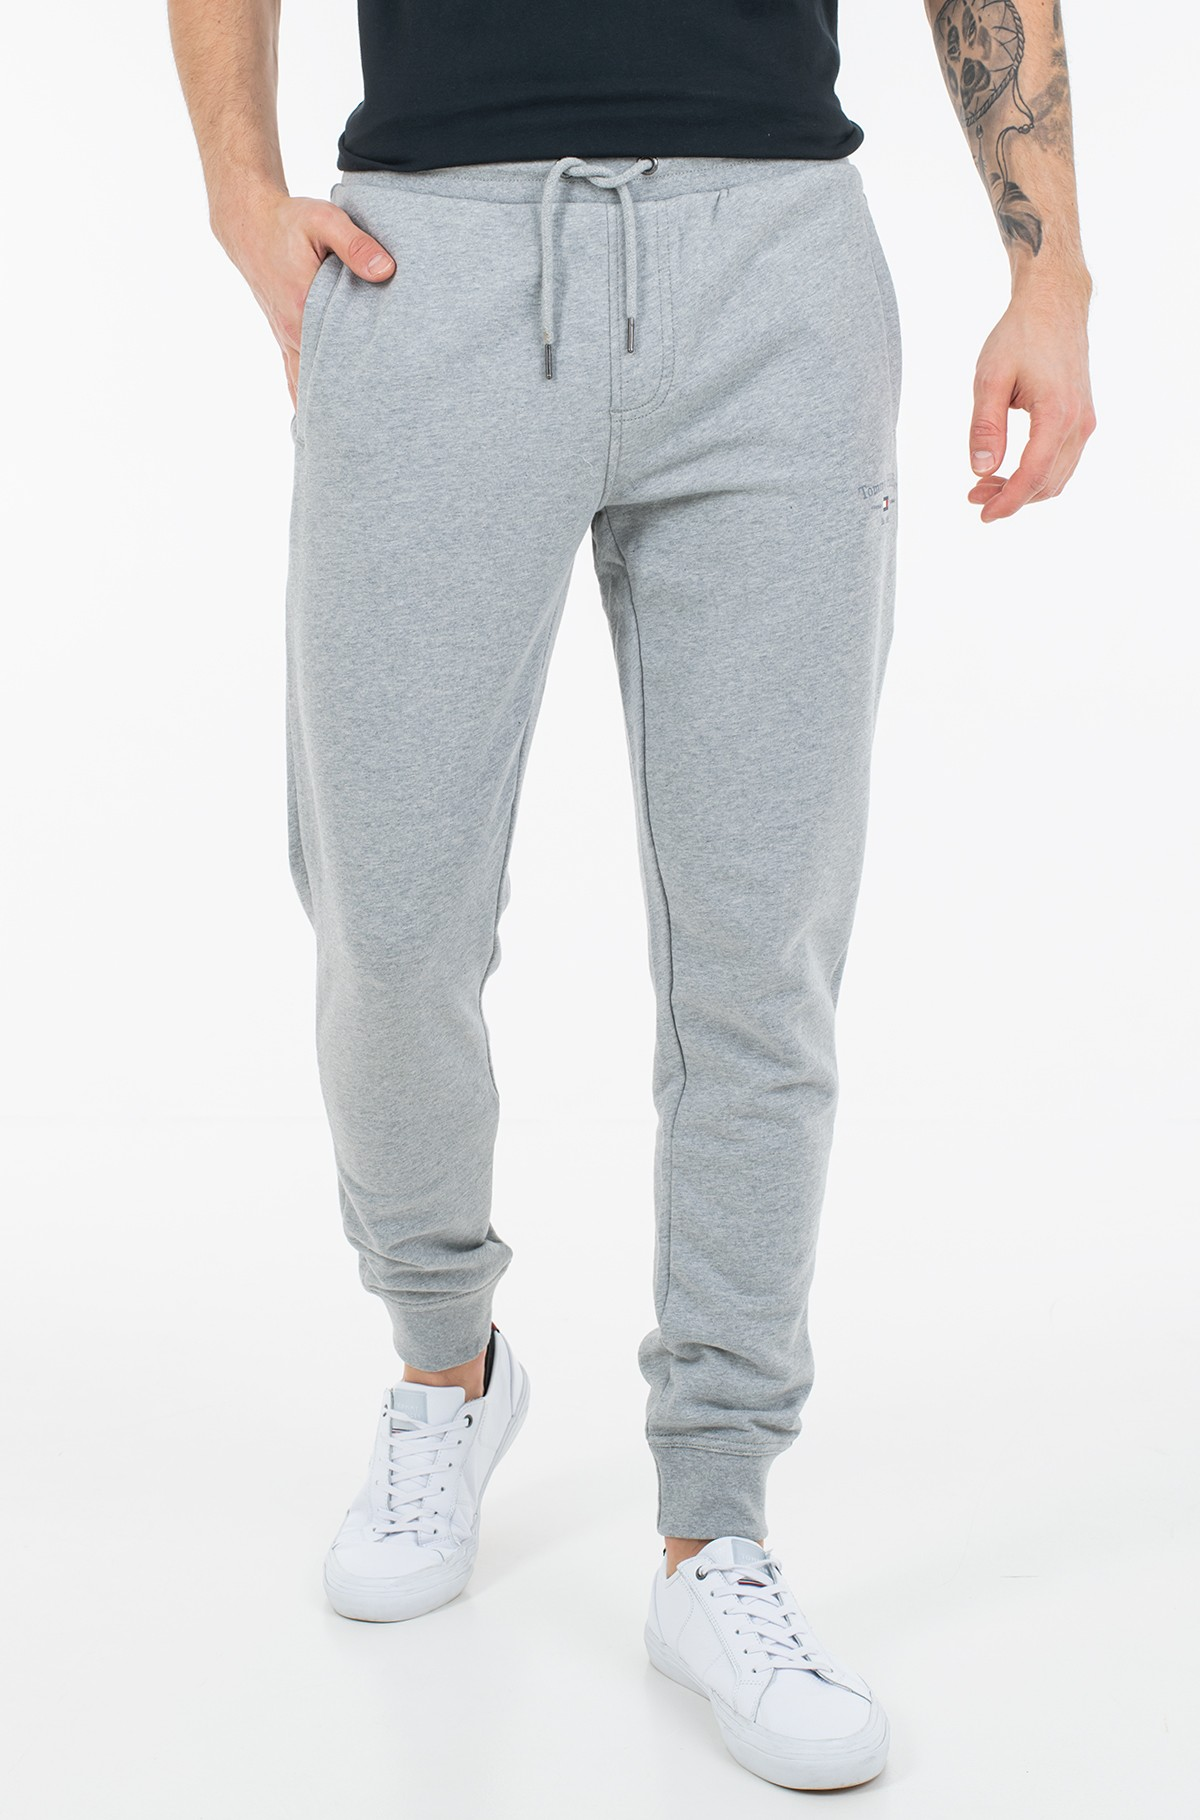 Sweatpants  SWEATPANTS WITH PRINT-full-1